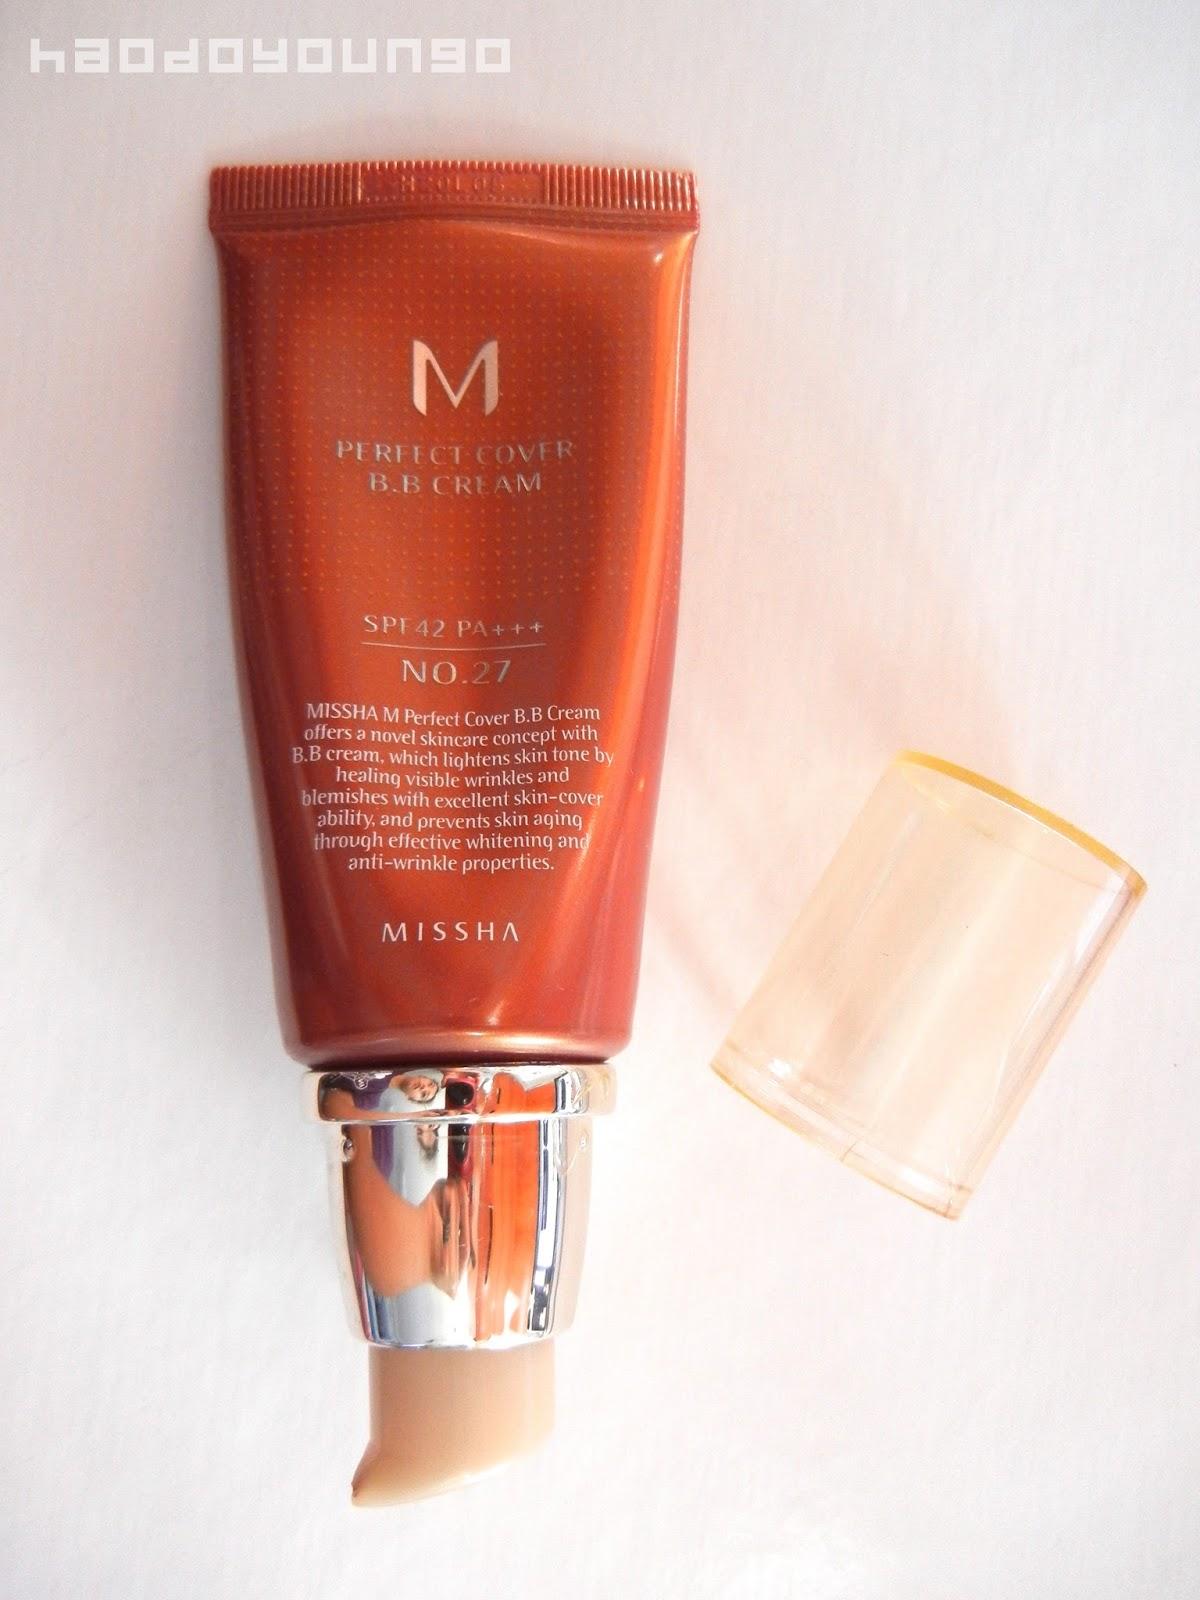 Missha 27 bb cream